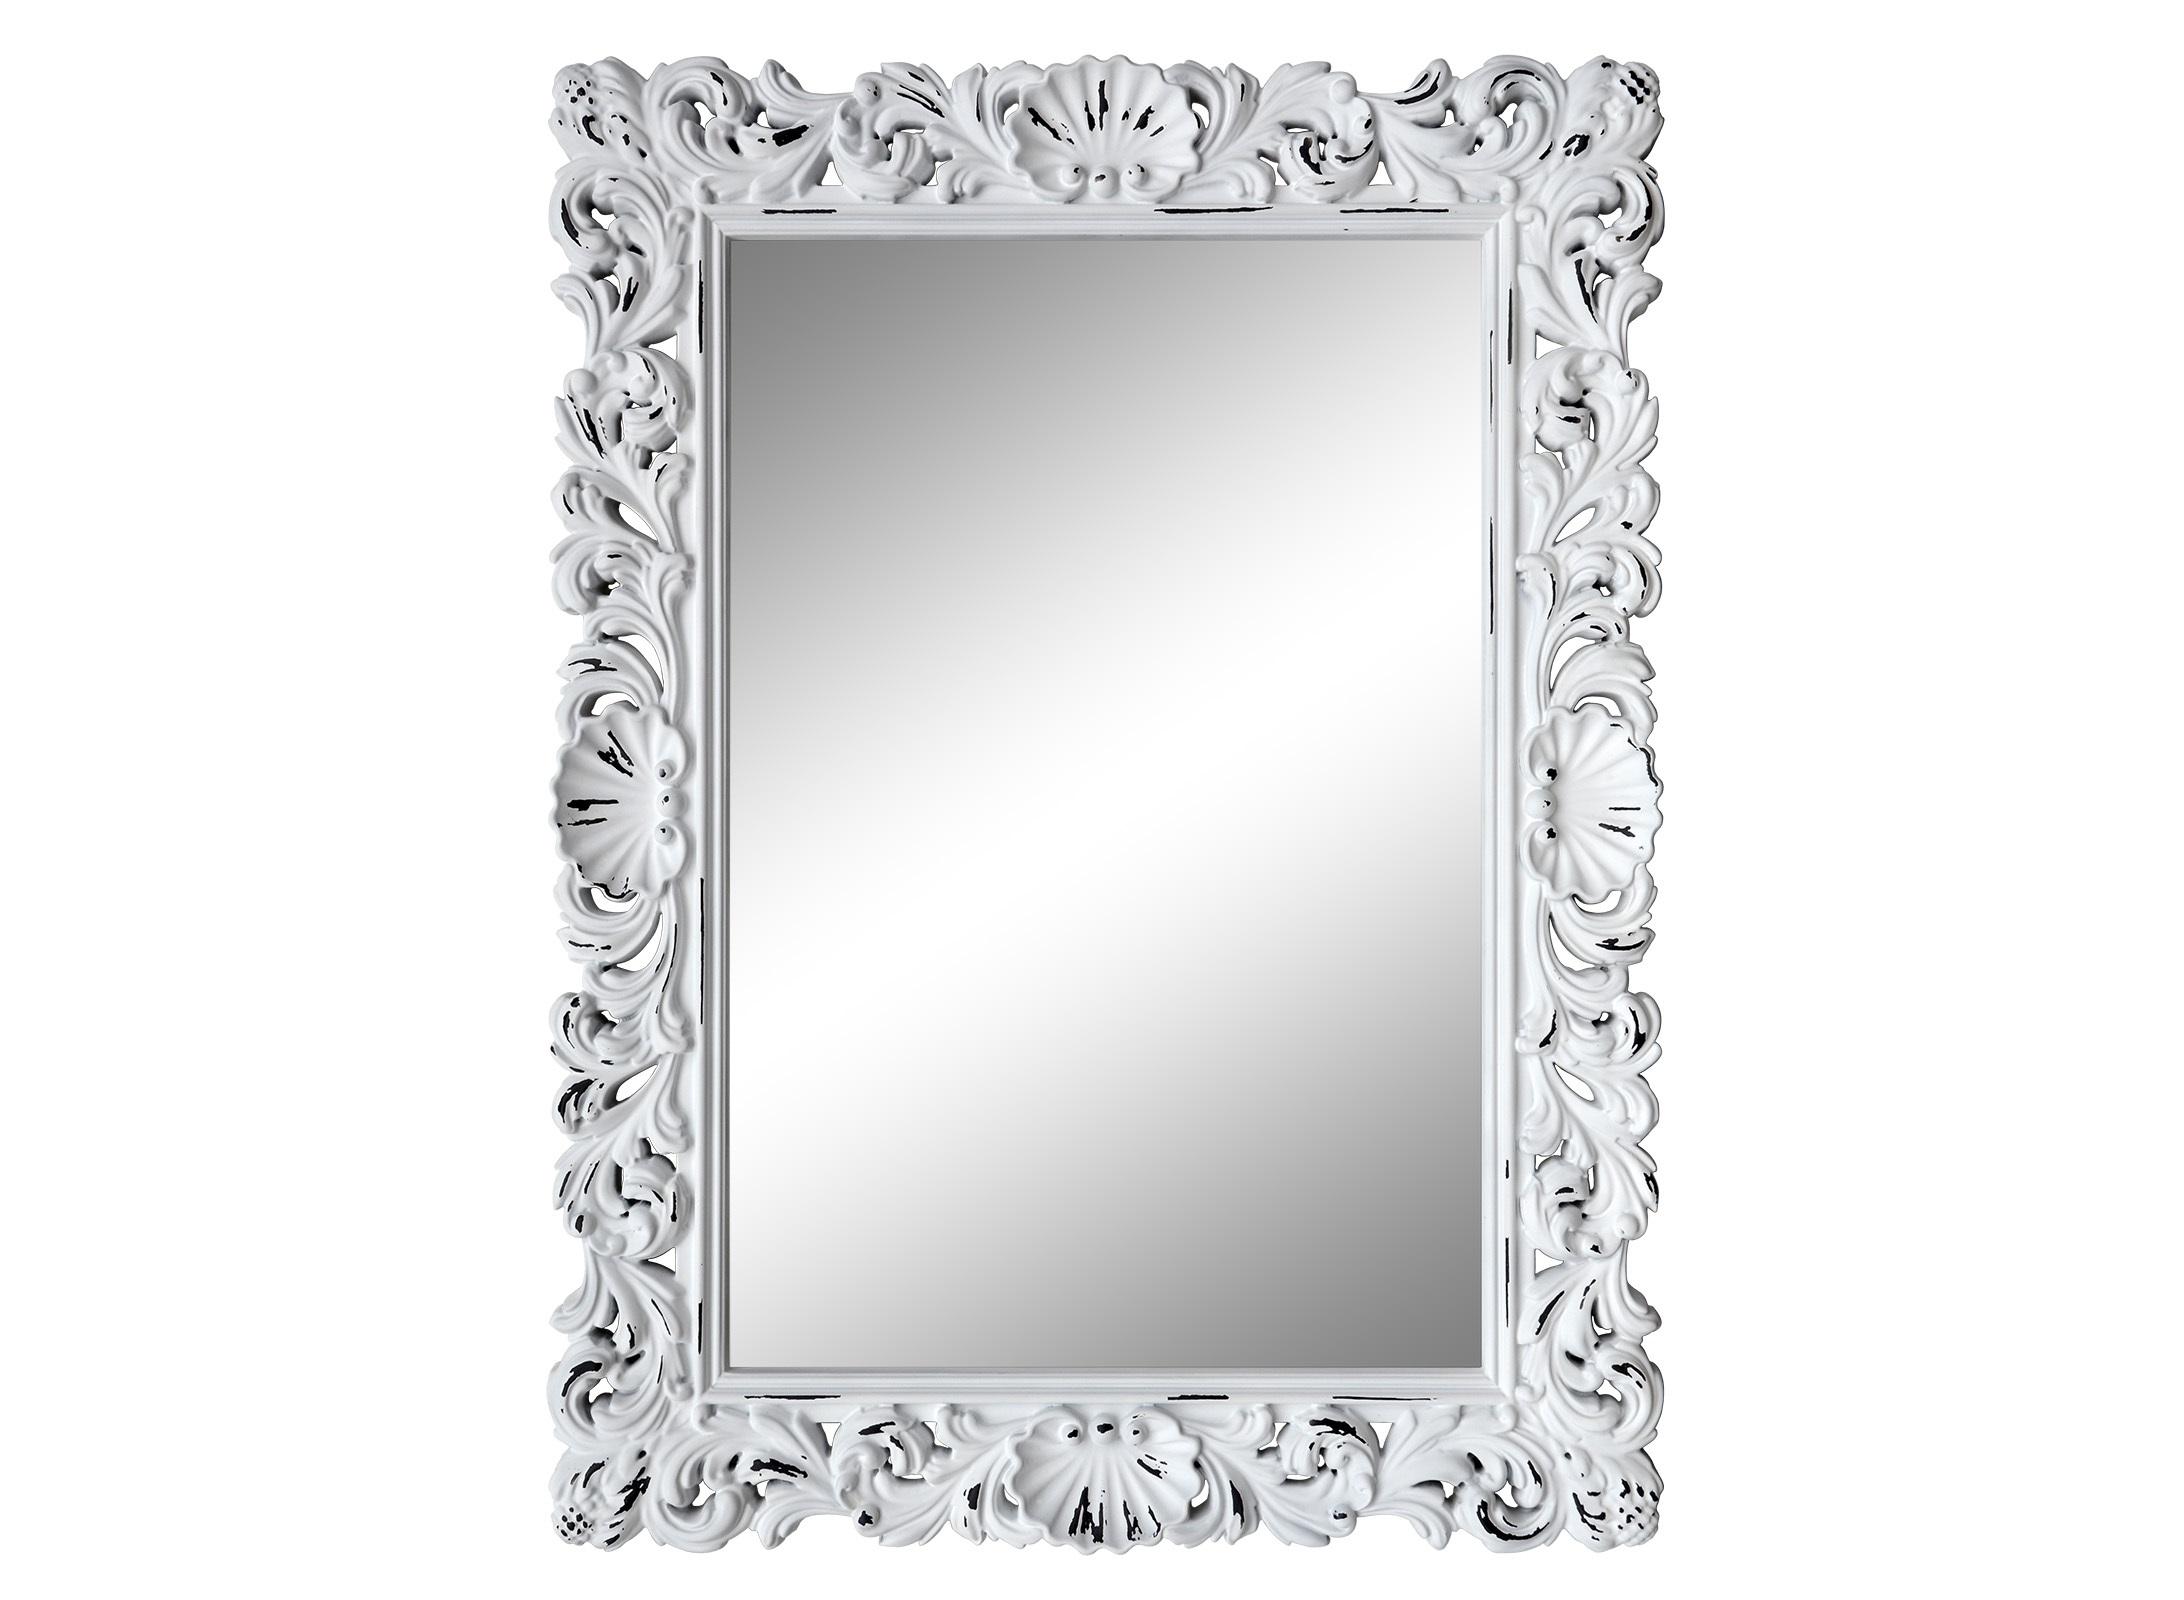 Зеркало Reeforma 15430868 от thefurnish